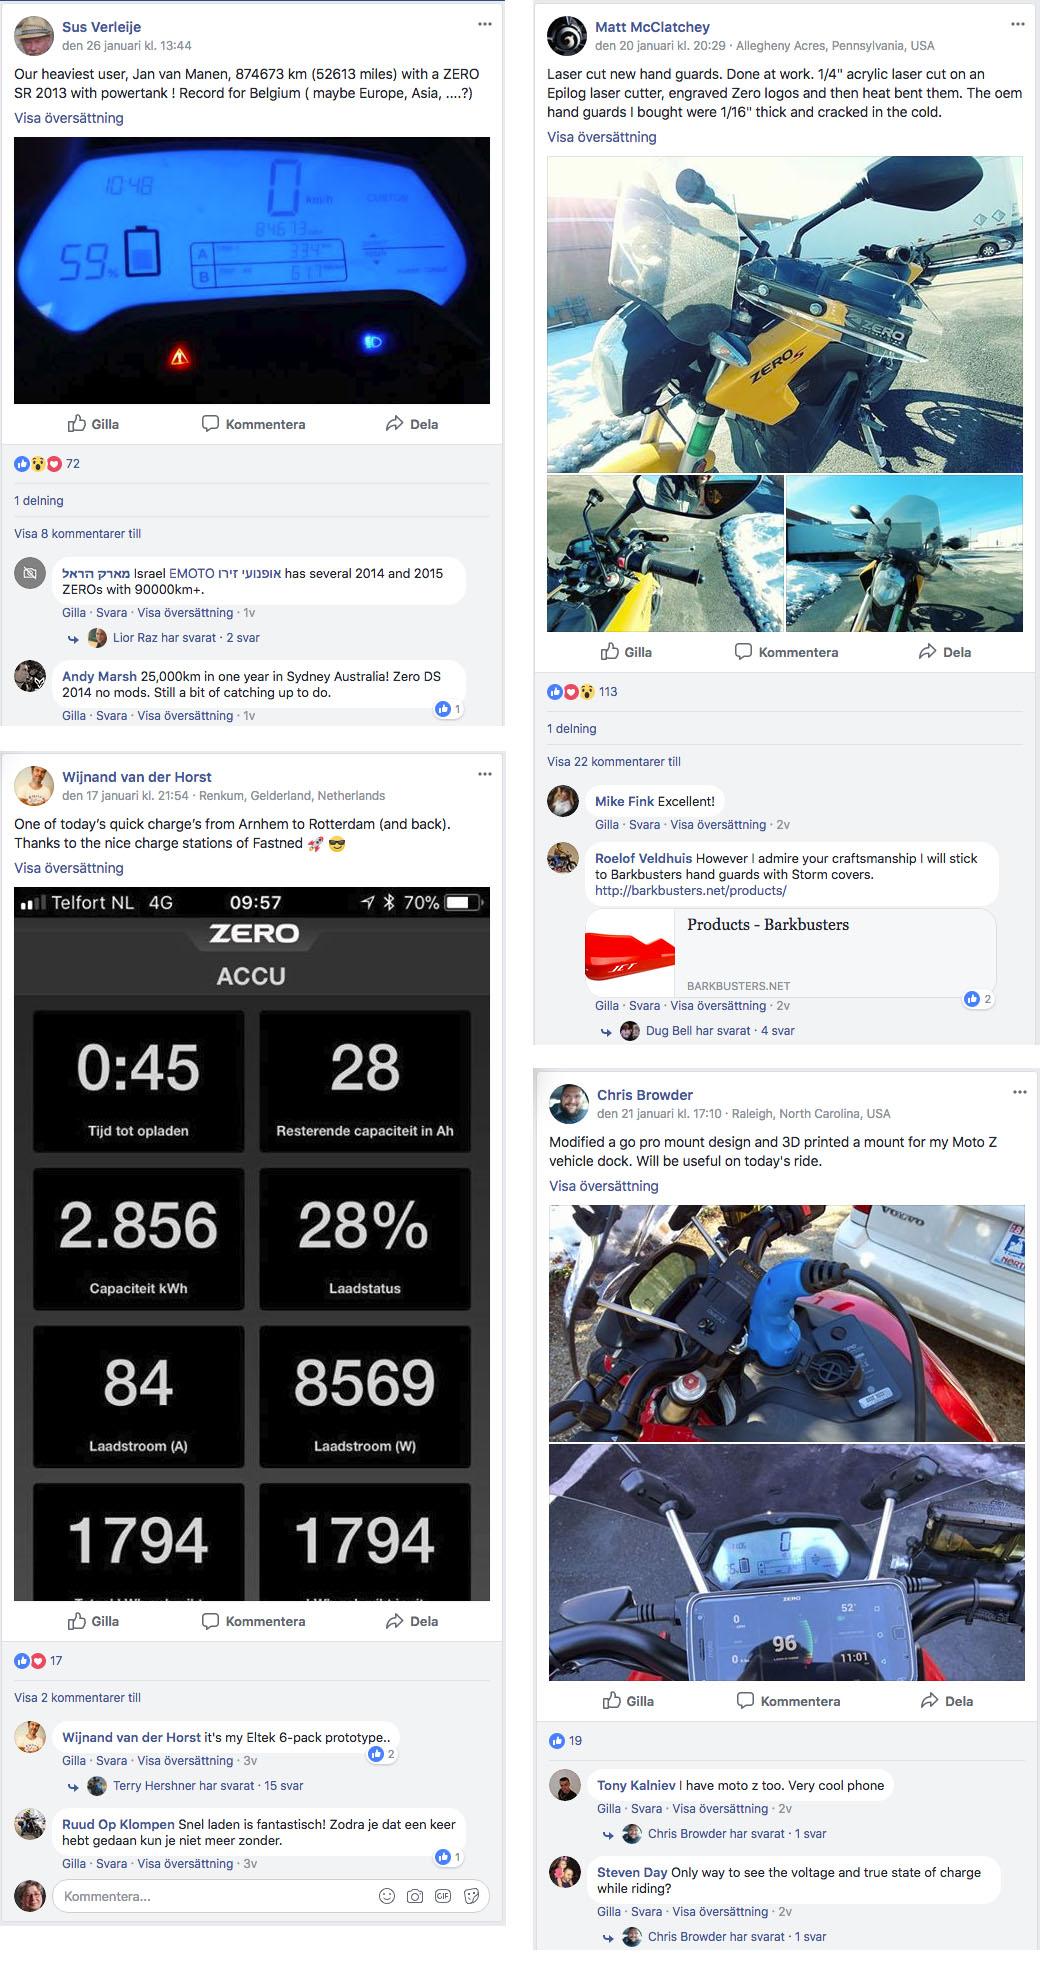 Urklipp från från Facebook-gruppen Zero Motorcycles Owners Group.